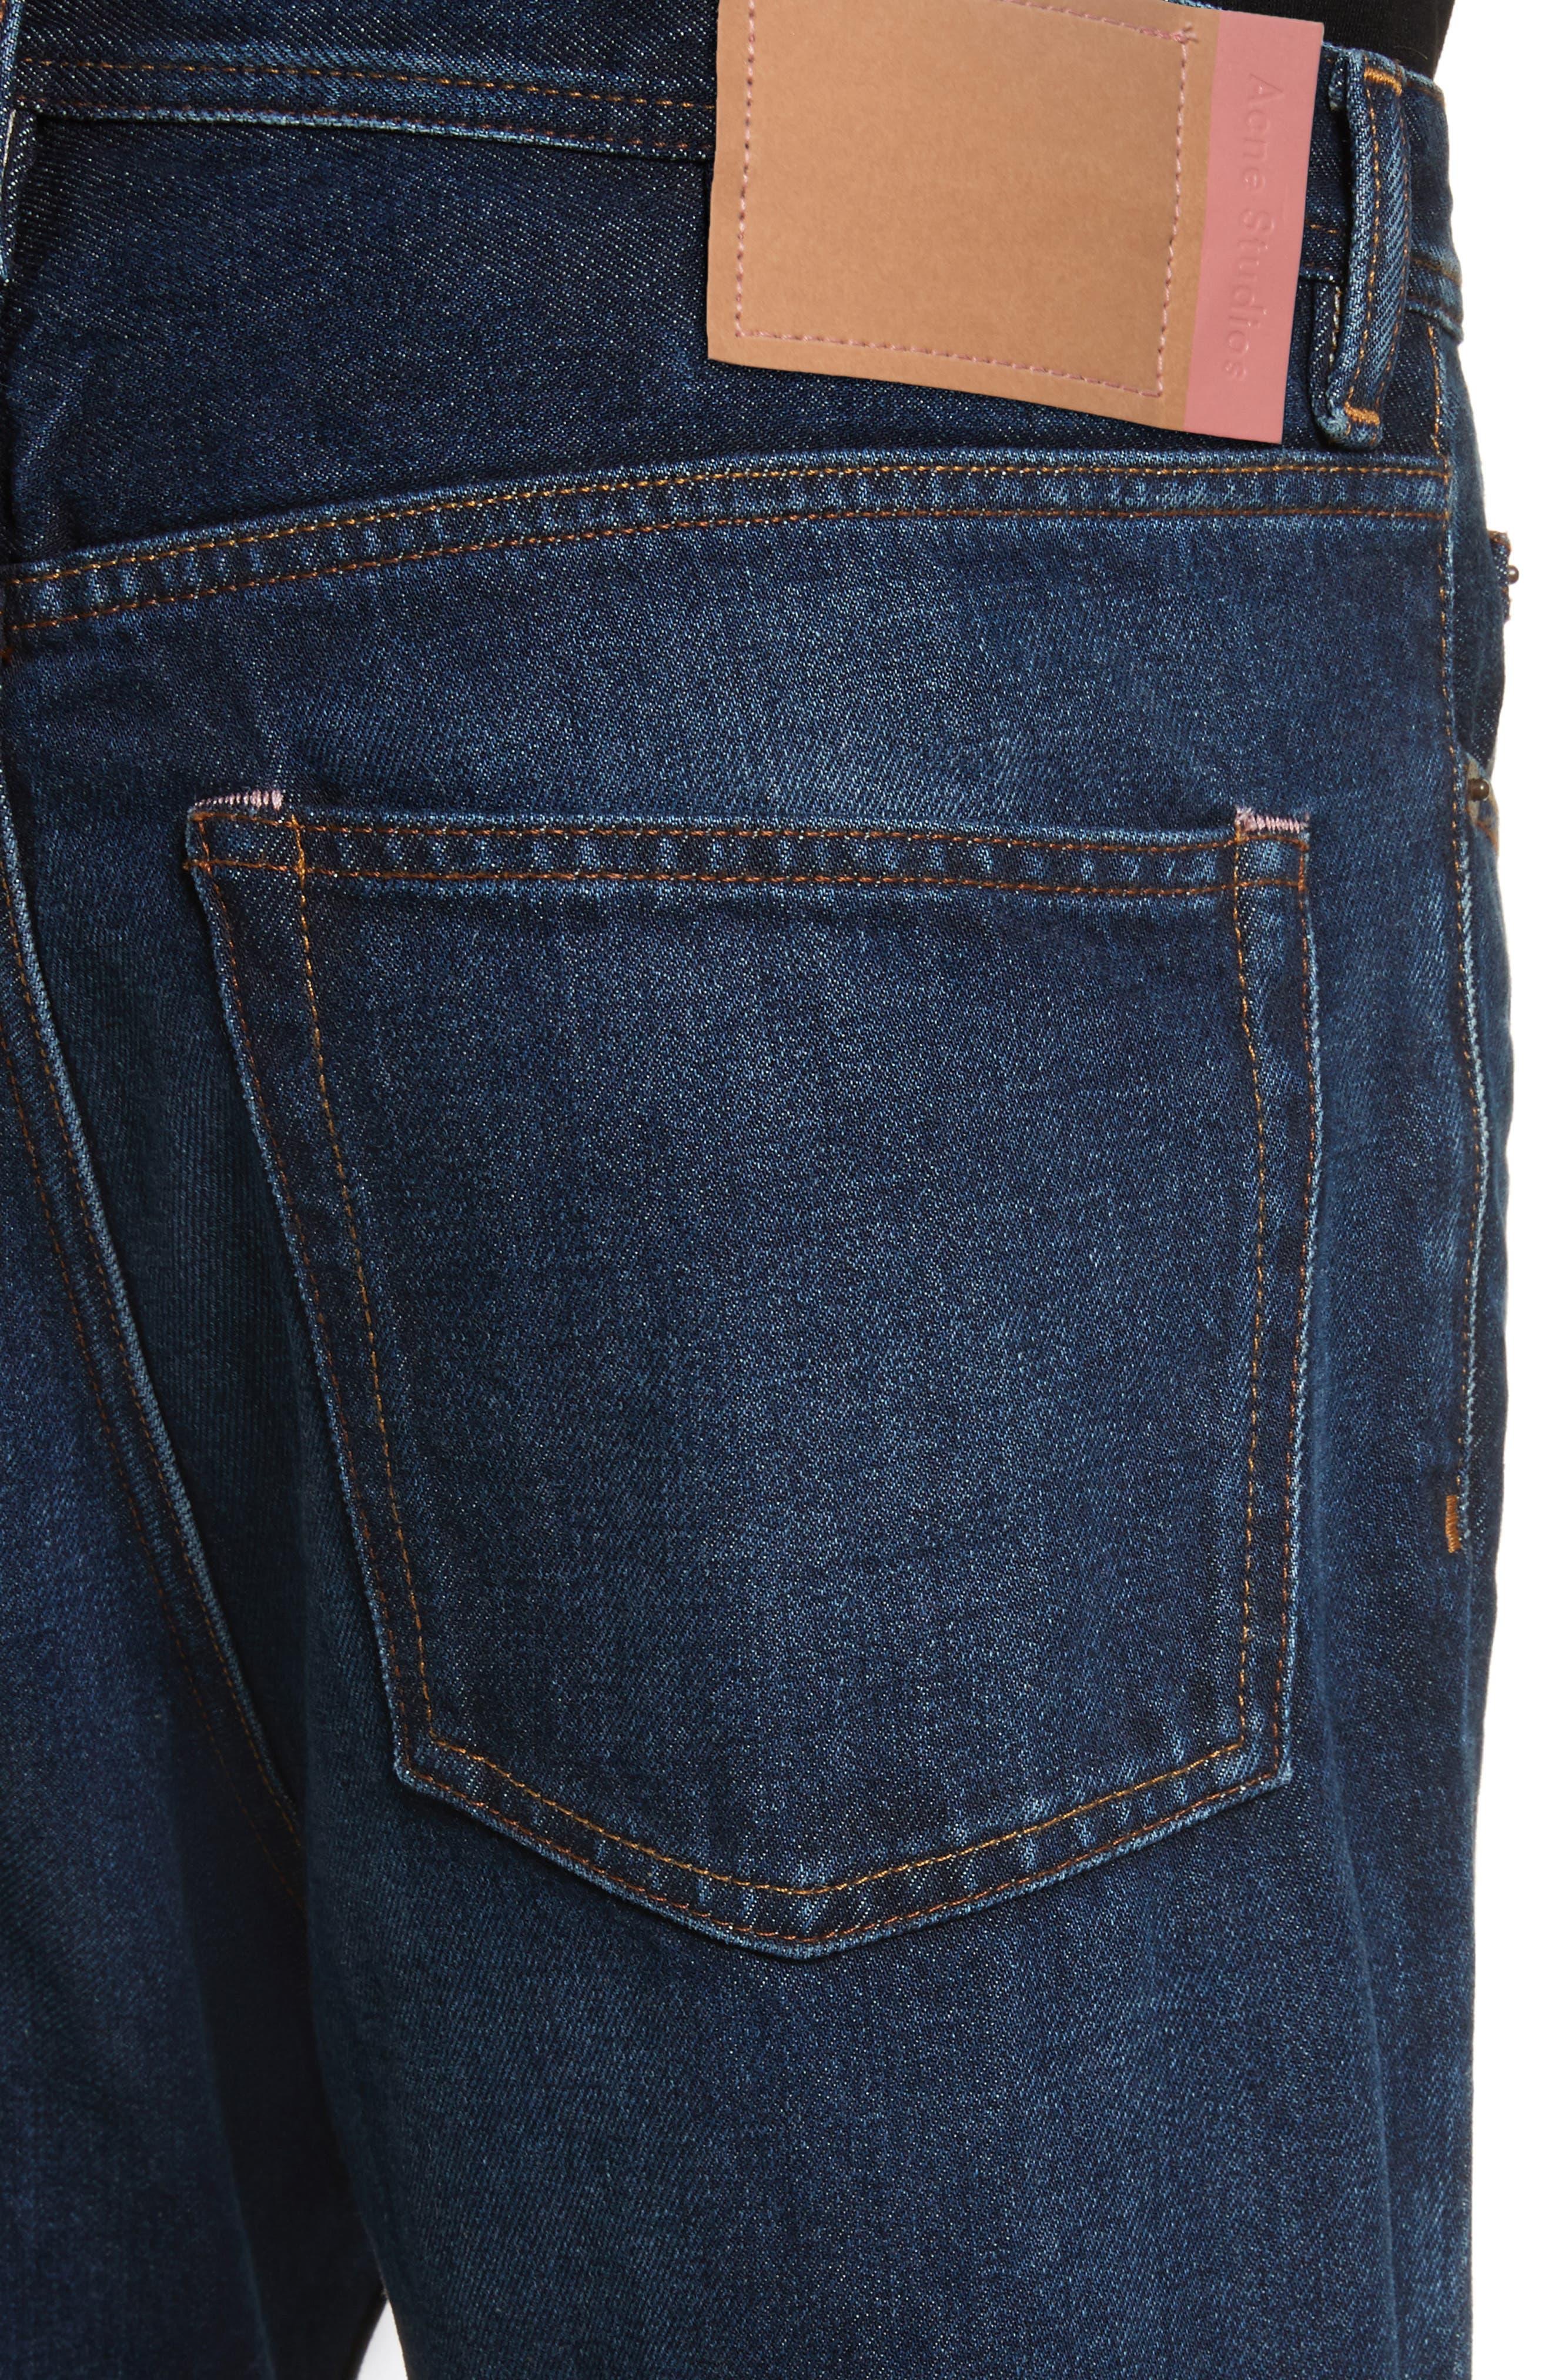 Land Classic Straight Leg Jeans,                             Alternate thumbnail 4, color,                             123 Dk Blue